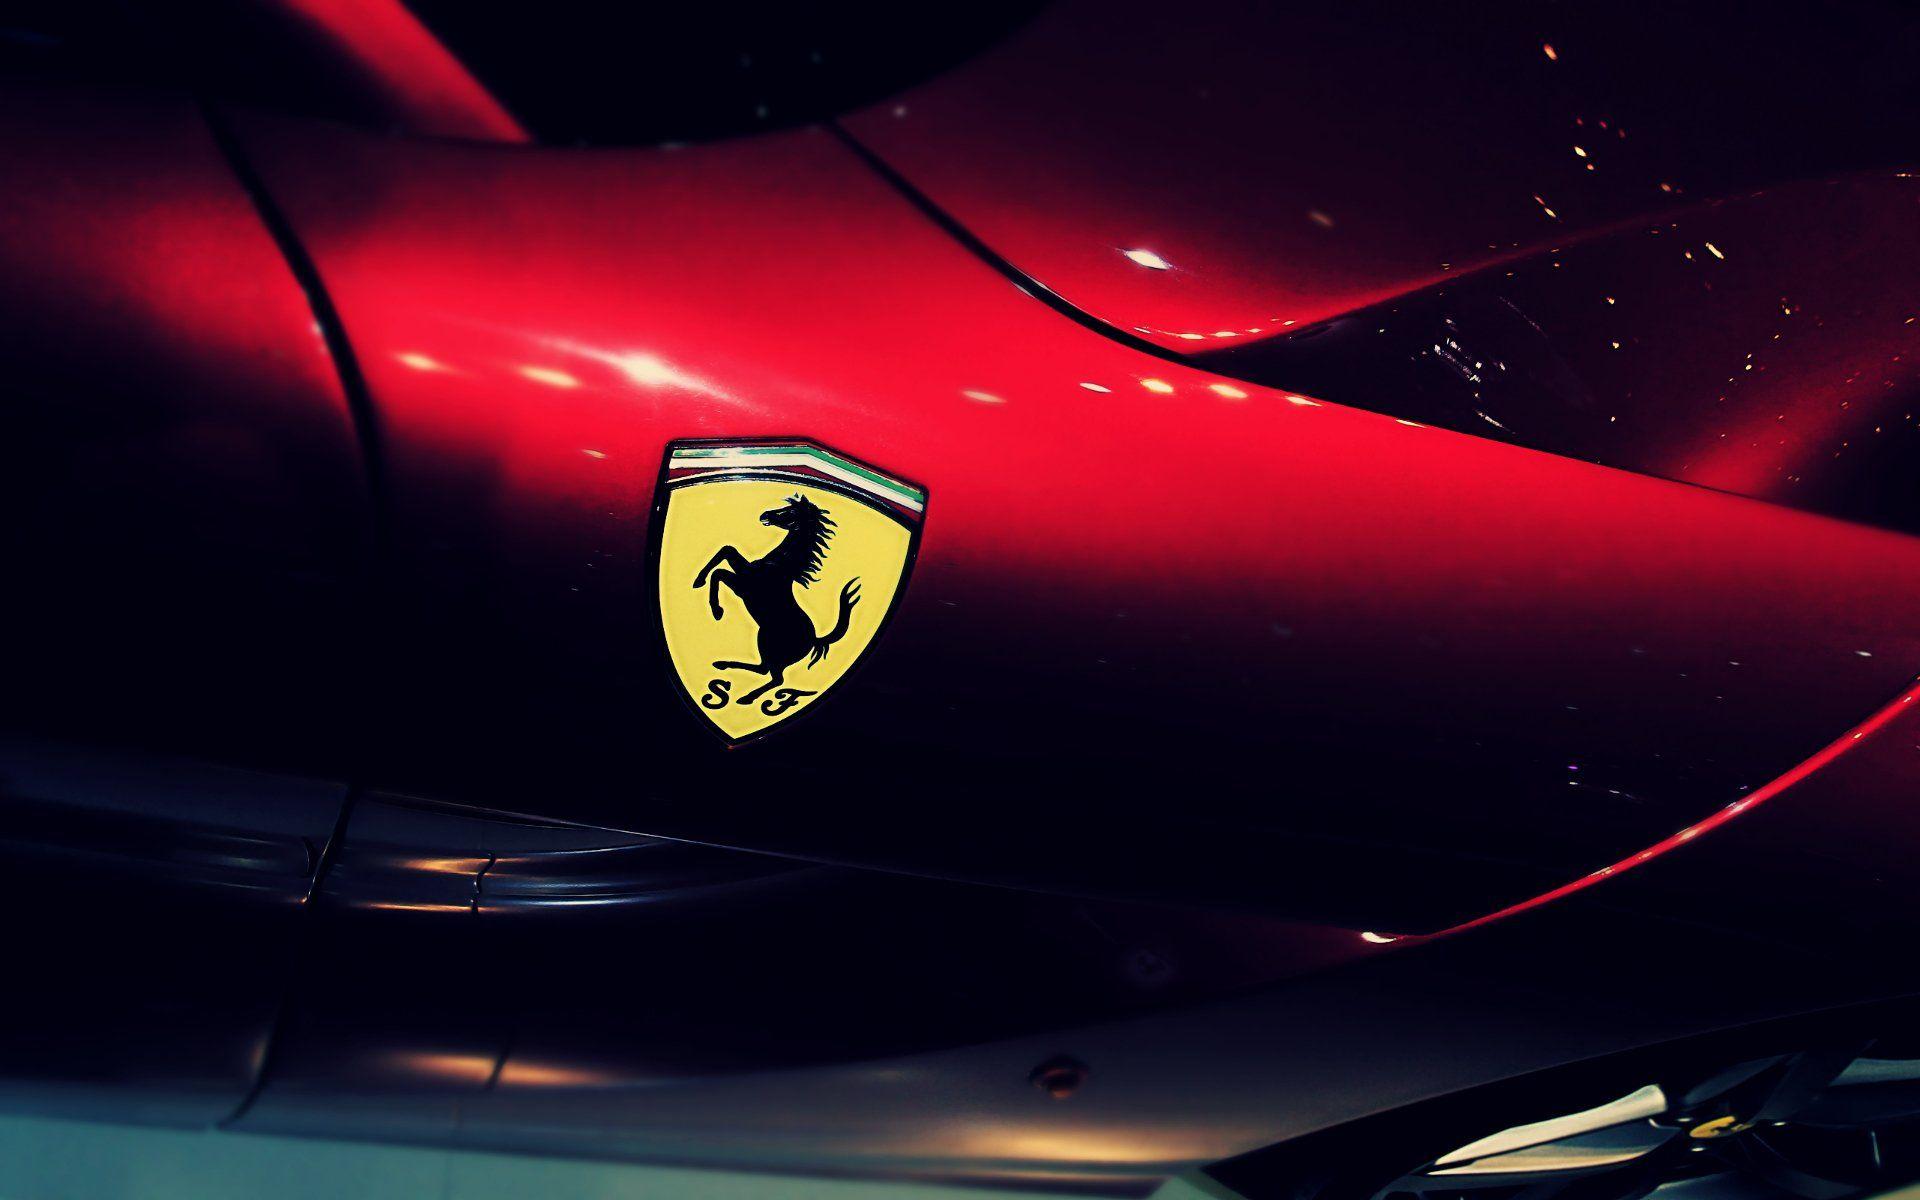 Hd ferrari wallpapers for free download 1920 1080 - Ferrari hd wallpapers free download ...